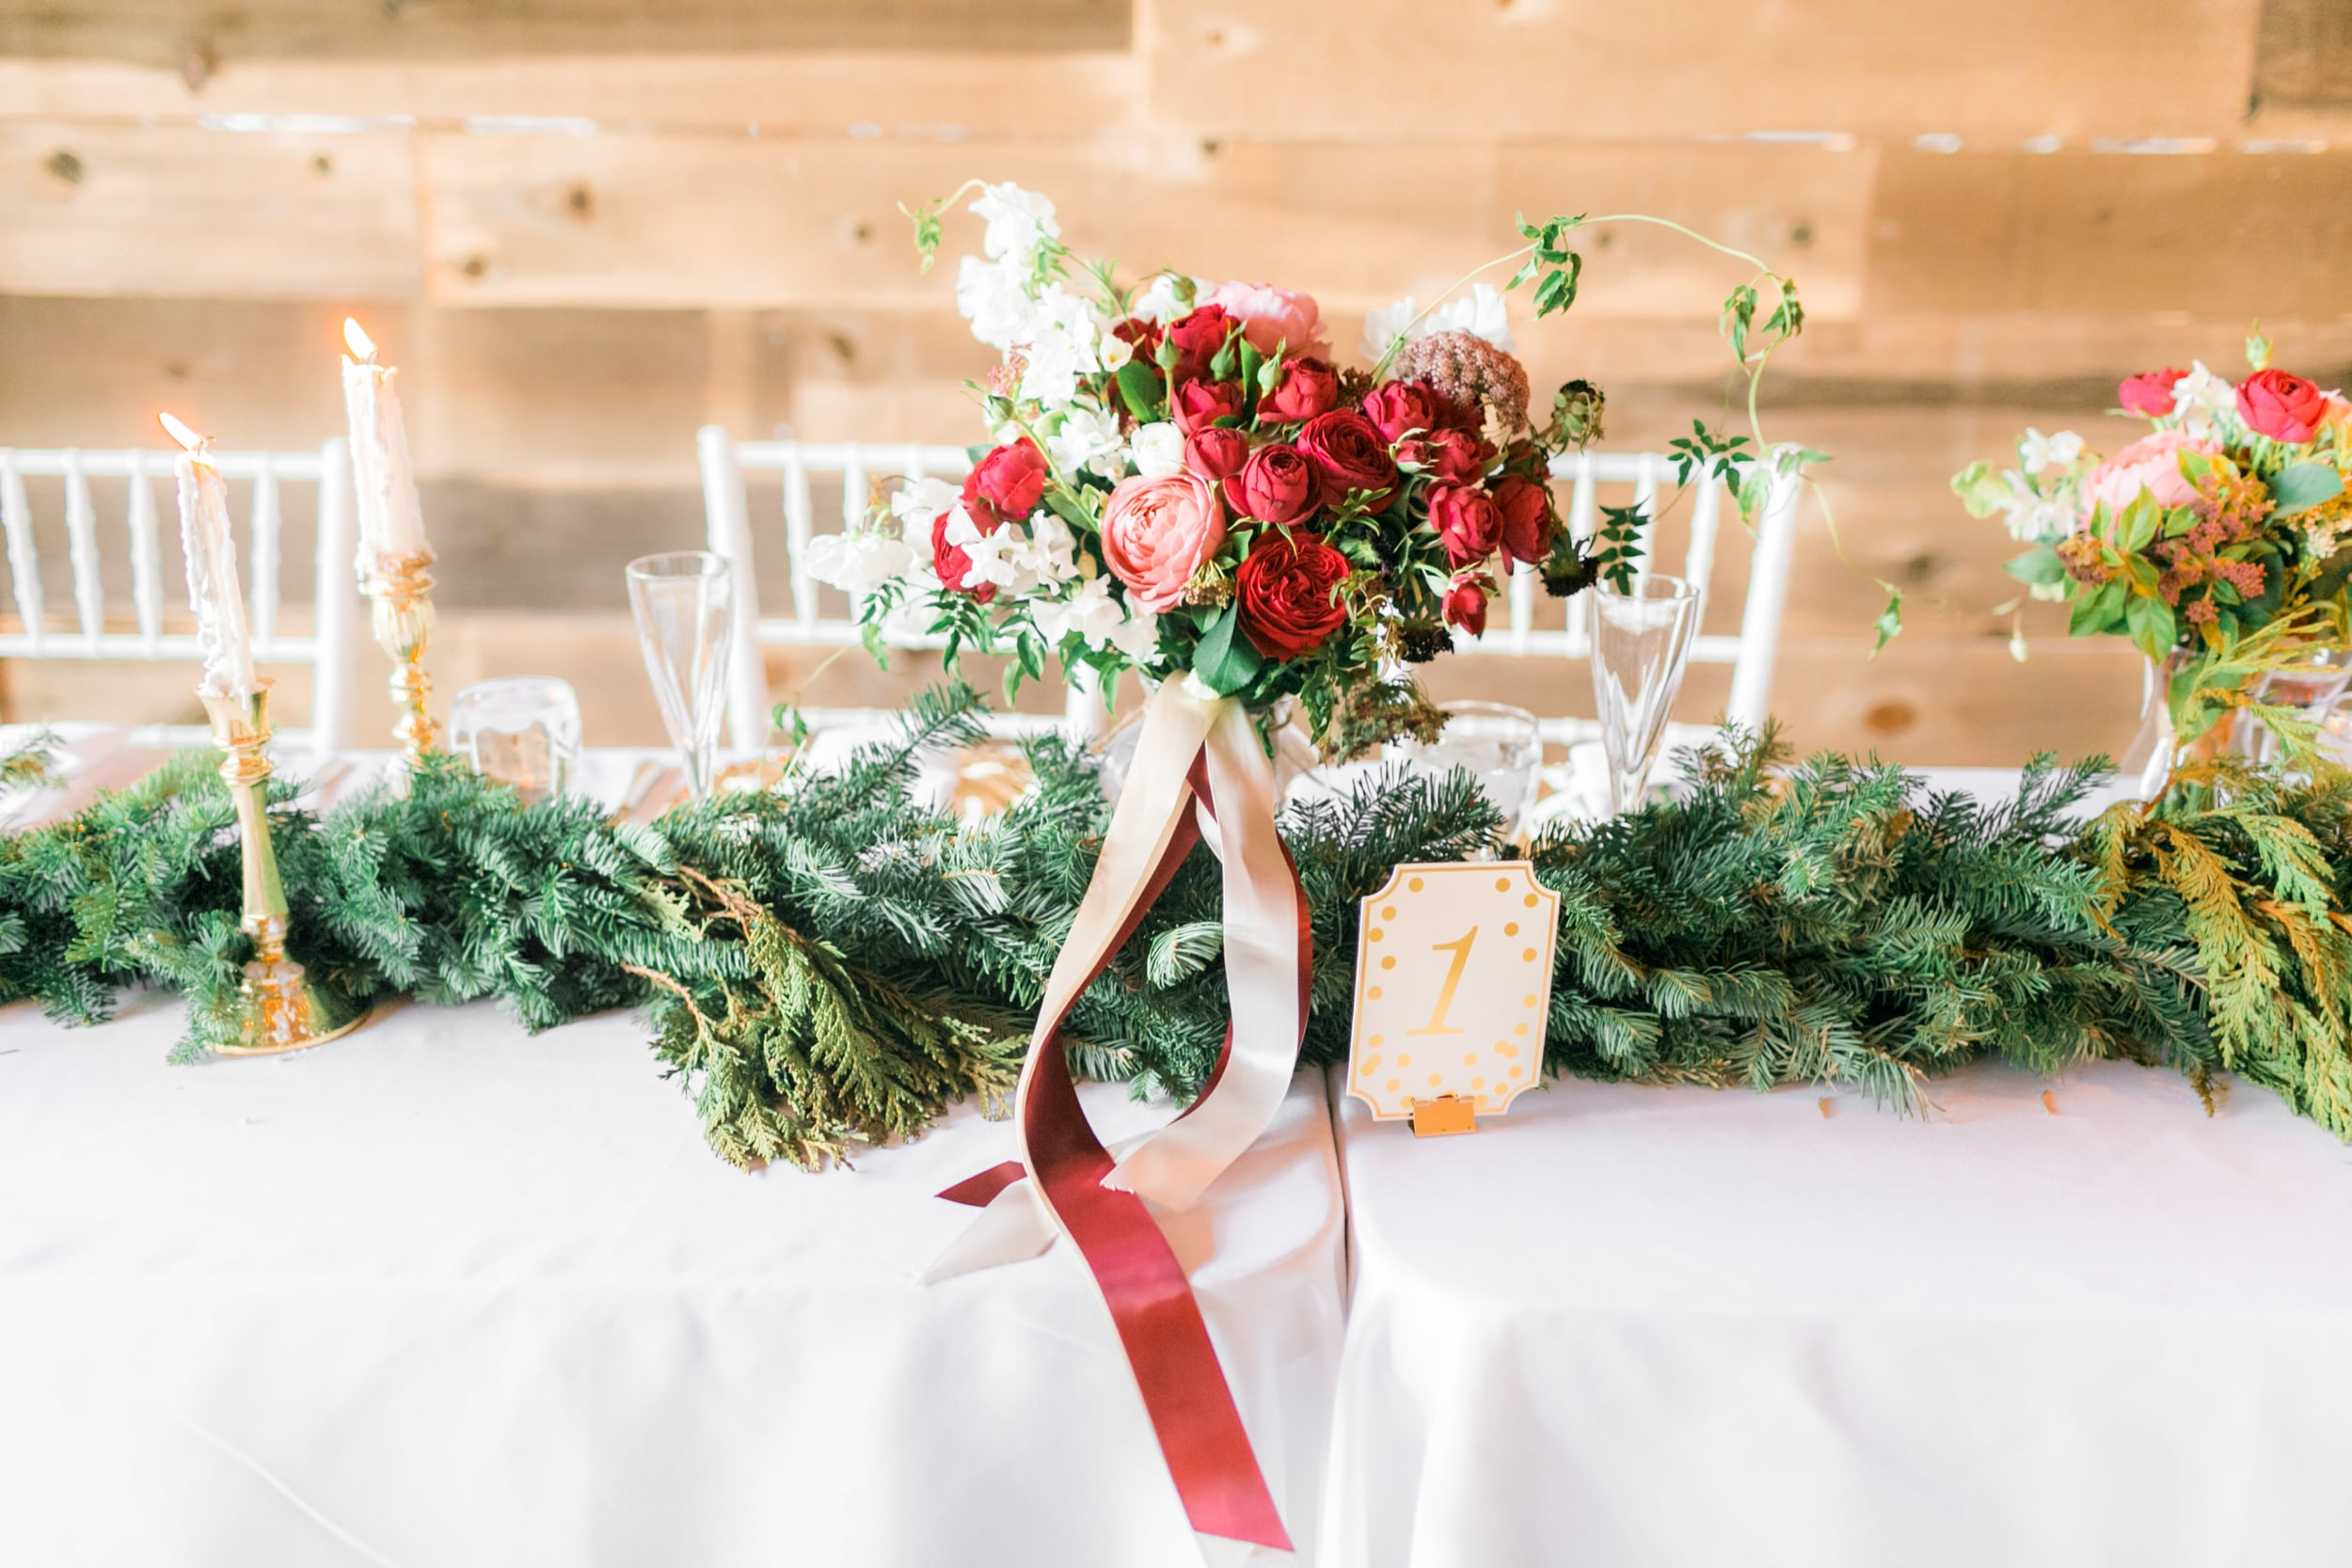 Natalie_Schutt_Photography_Winter_Wedding_San_Luis_Obispo-205.jpg